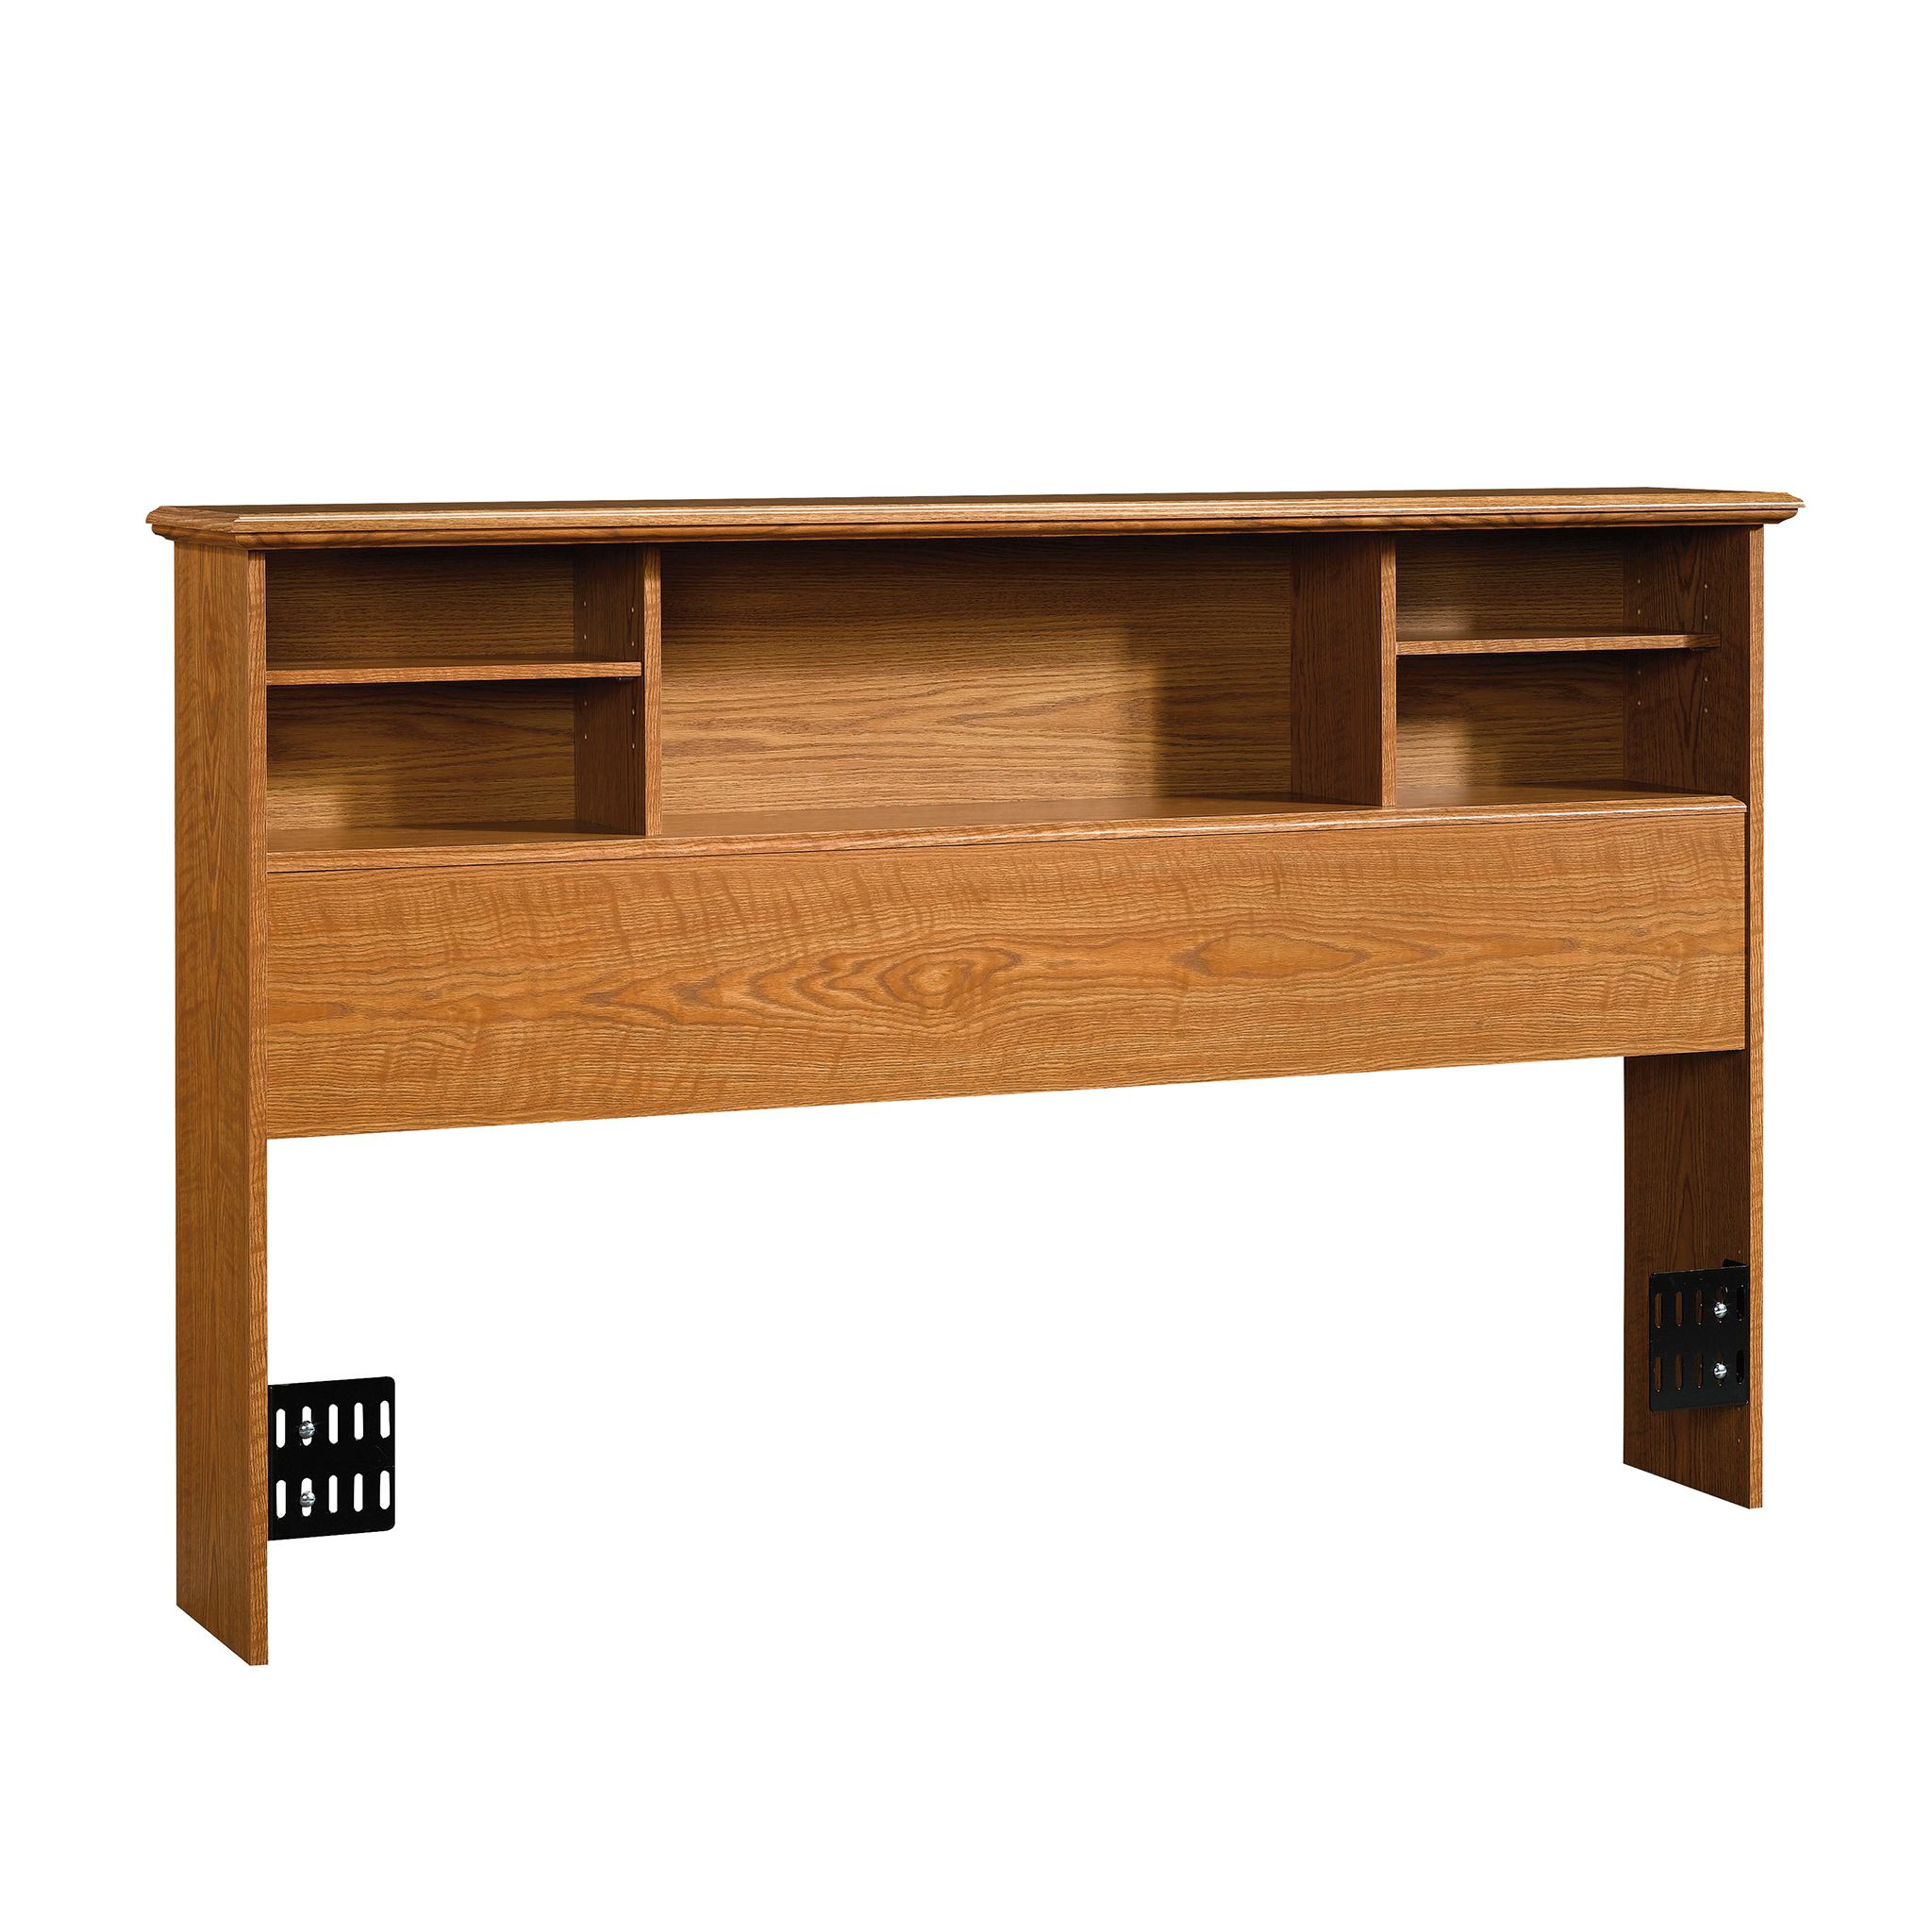 sauder orchard hills full queen bookcase headboard carolina oak finish walmart com